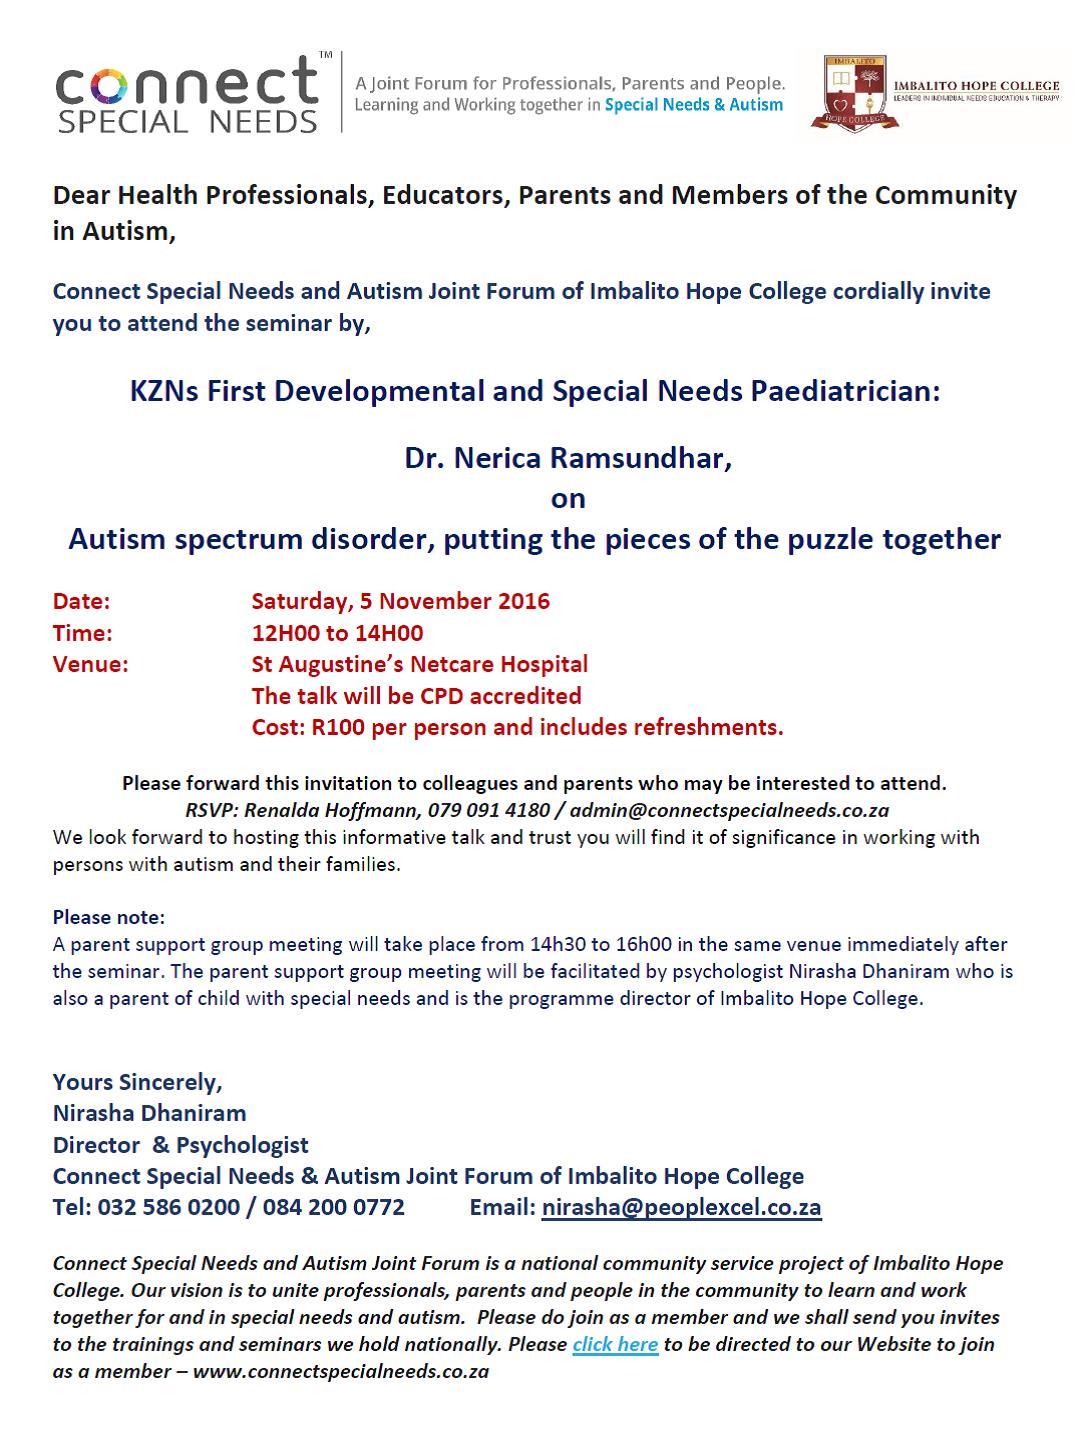 jpeg-invite-to-dr-ramsundhar-seminar